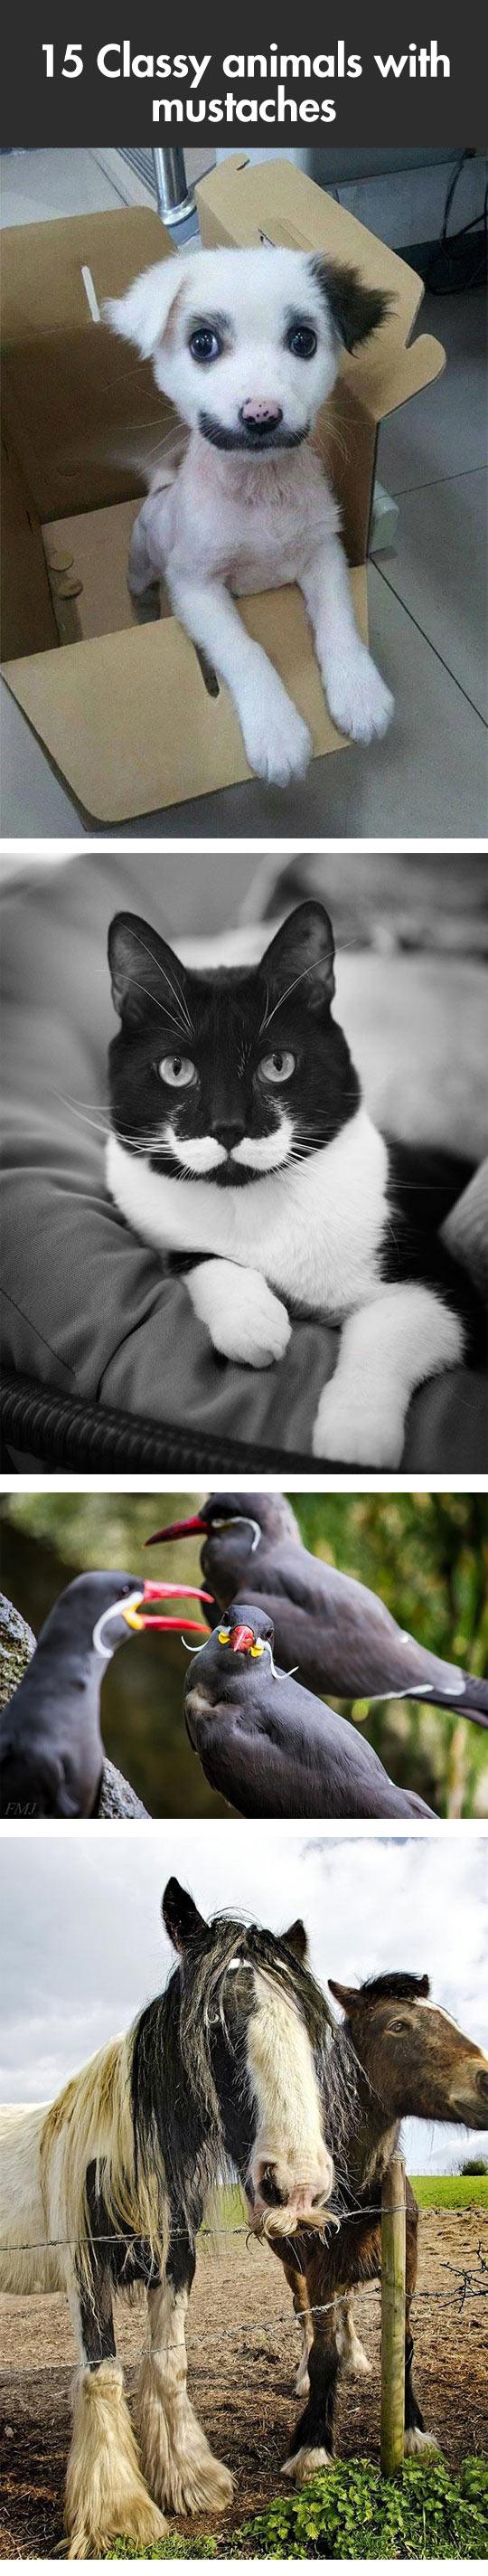 funny-classy-cat-dog-kitten